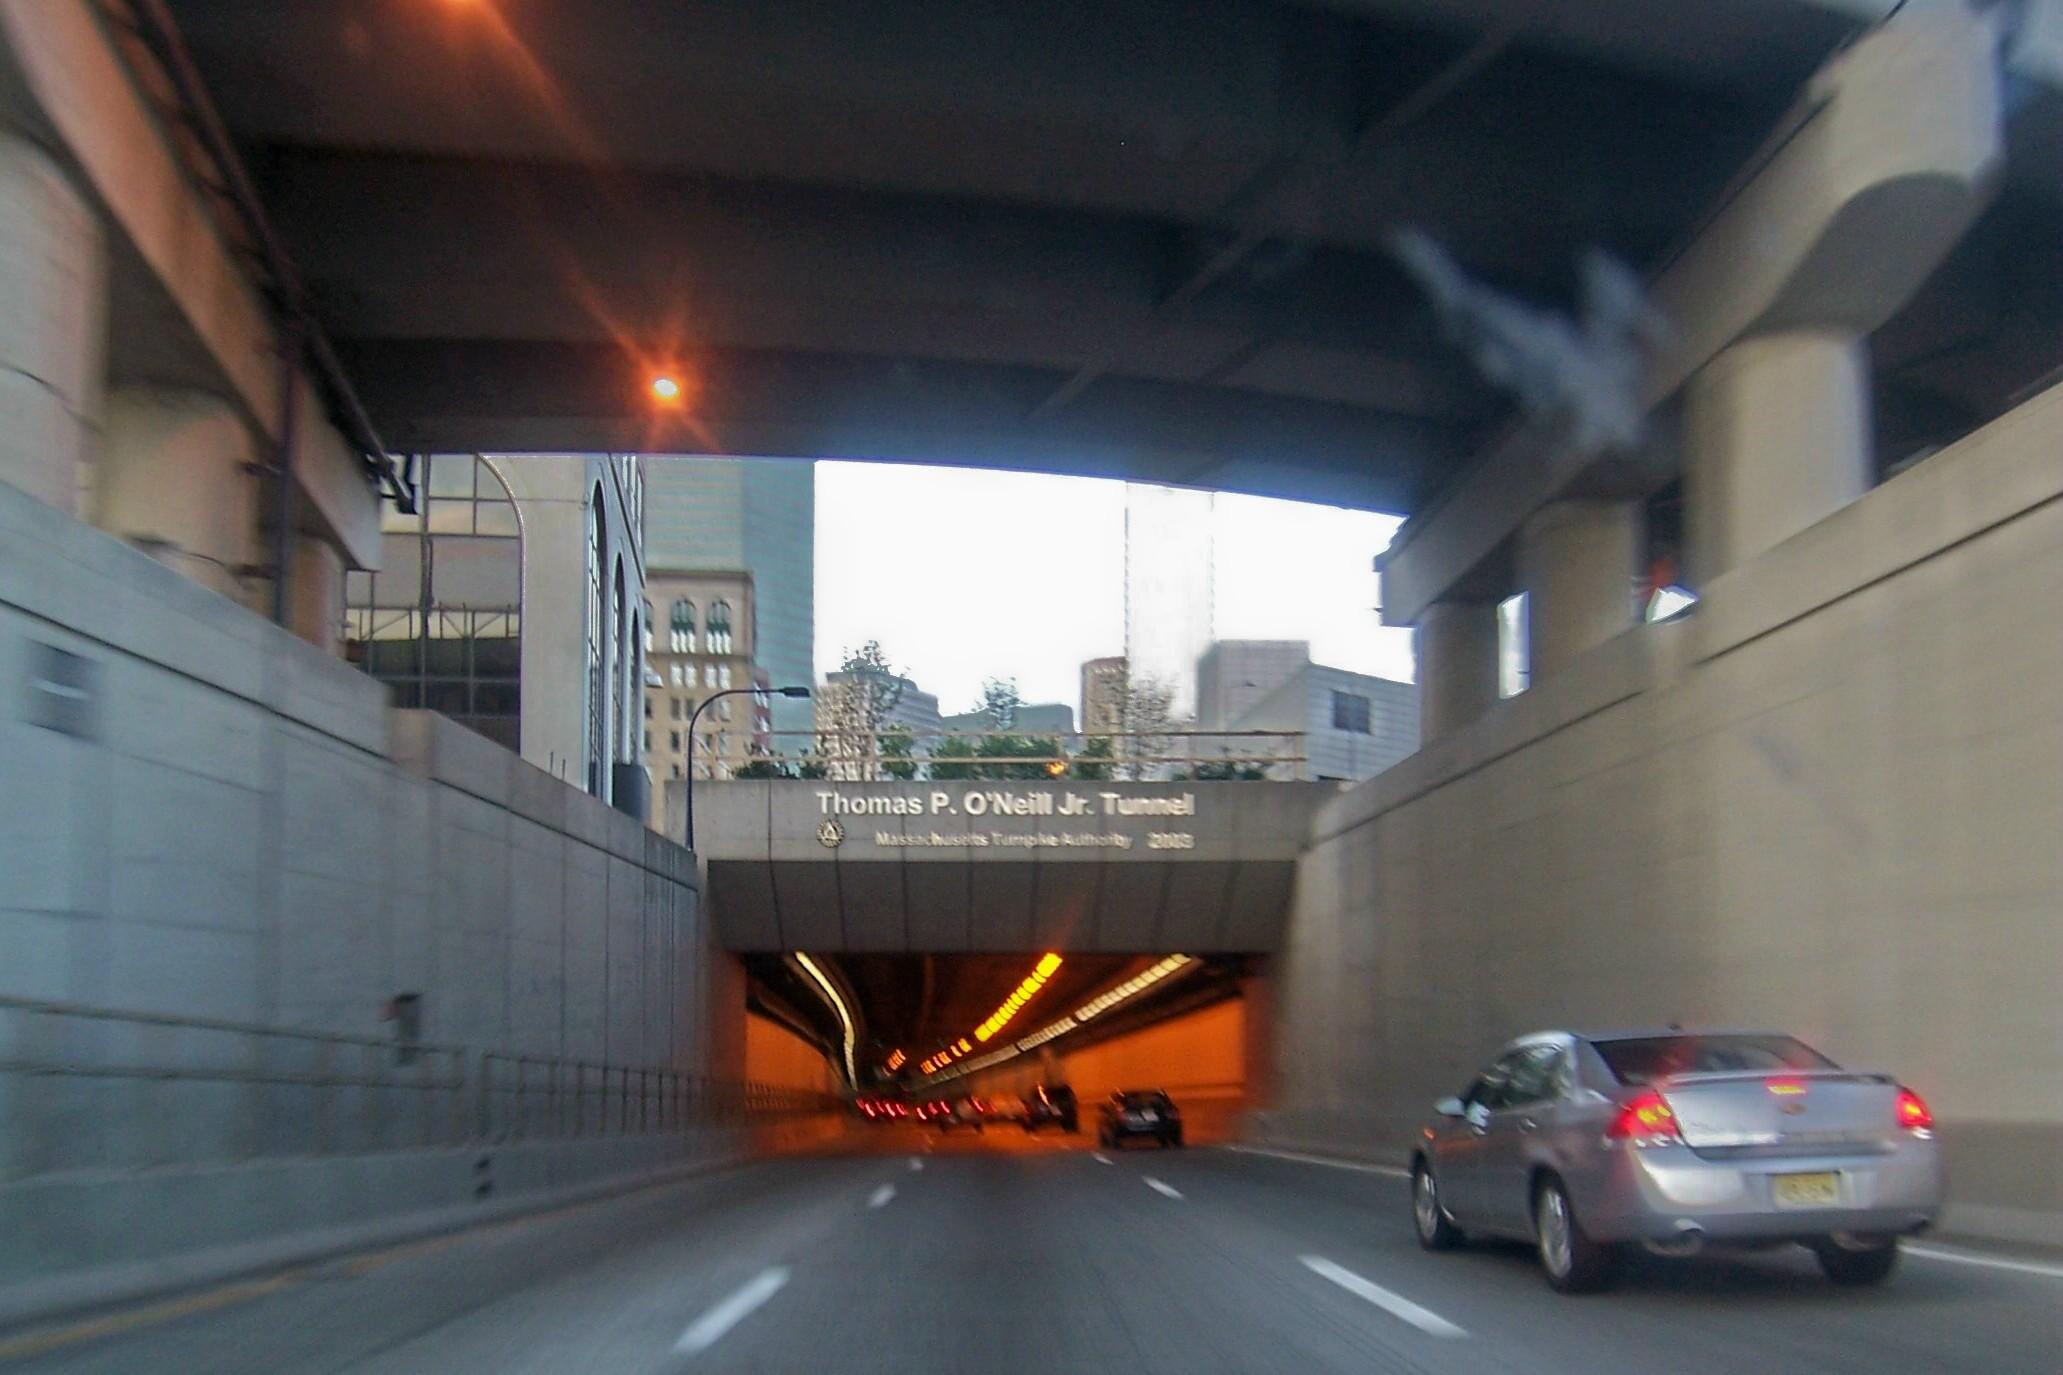 O'Neill Tunnel - Wikipedia